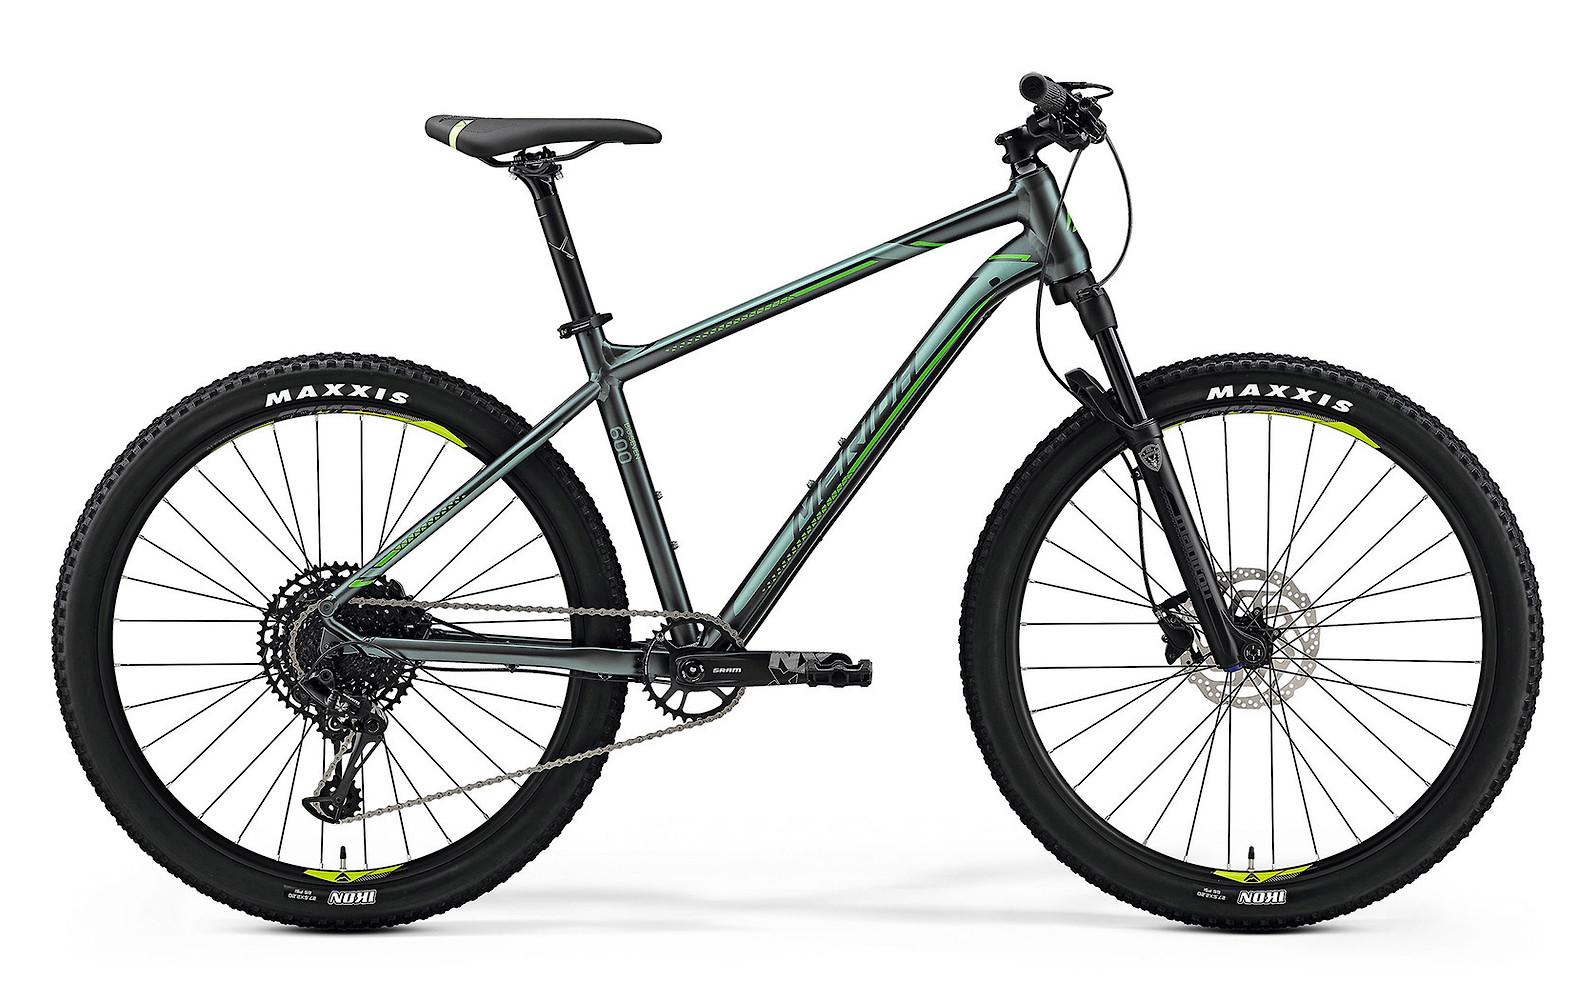 2019 Merida Big.Seven 600 Bike